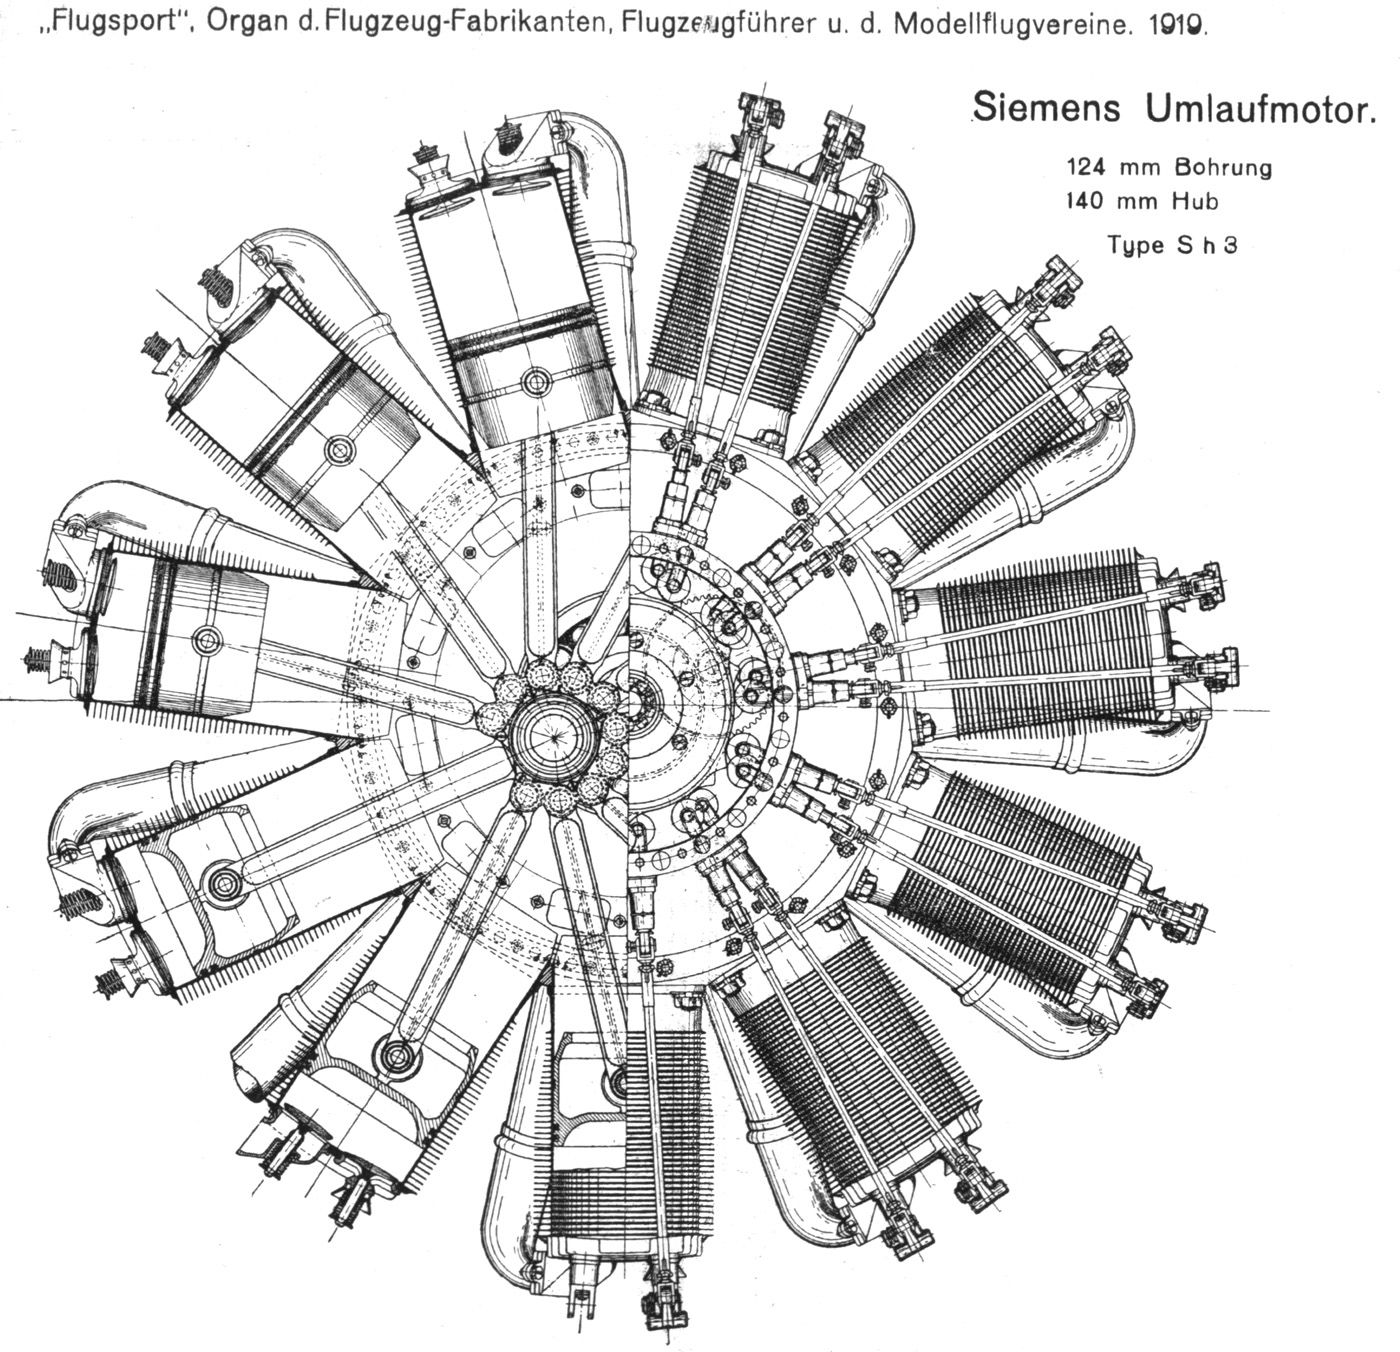 Siemens Halske Sh3 Rotary Aero Engine